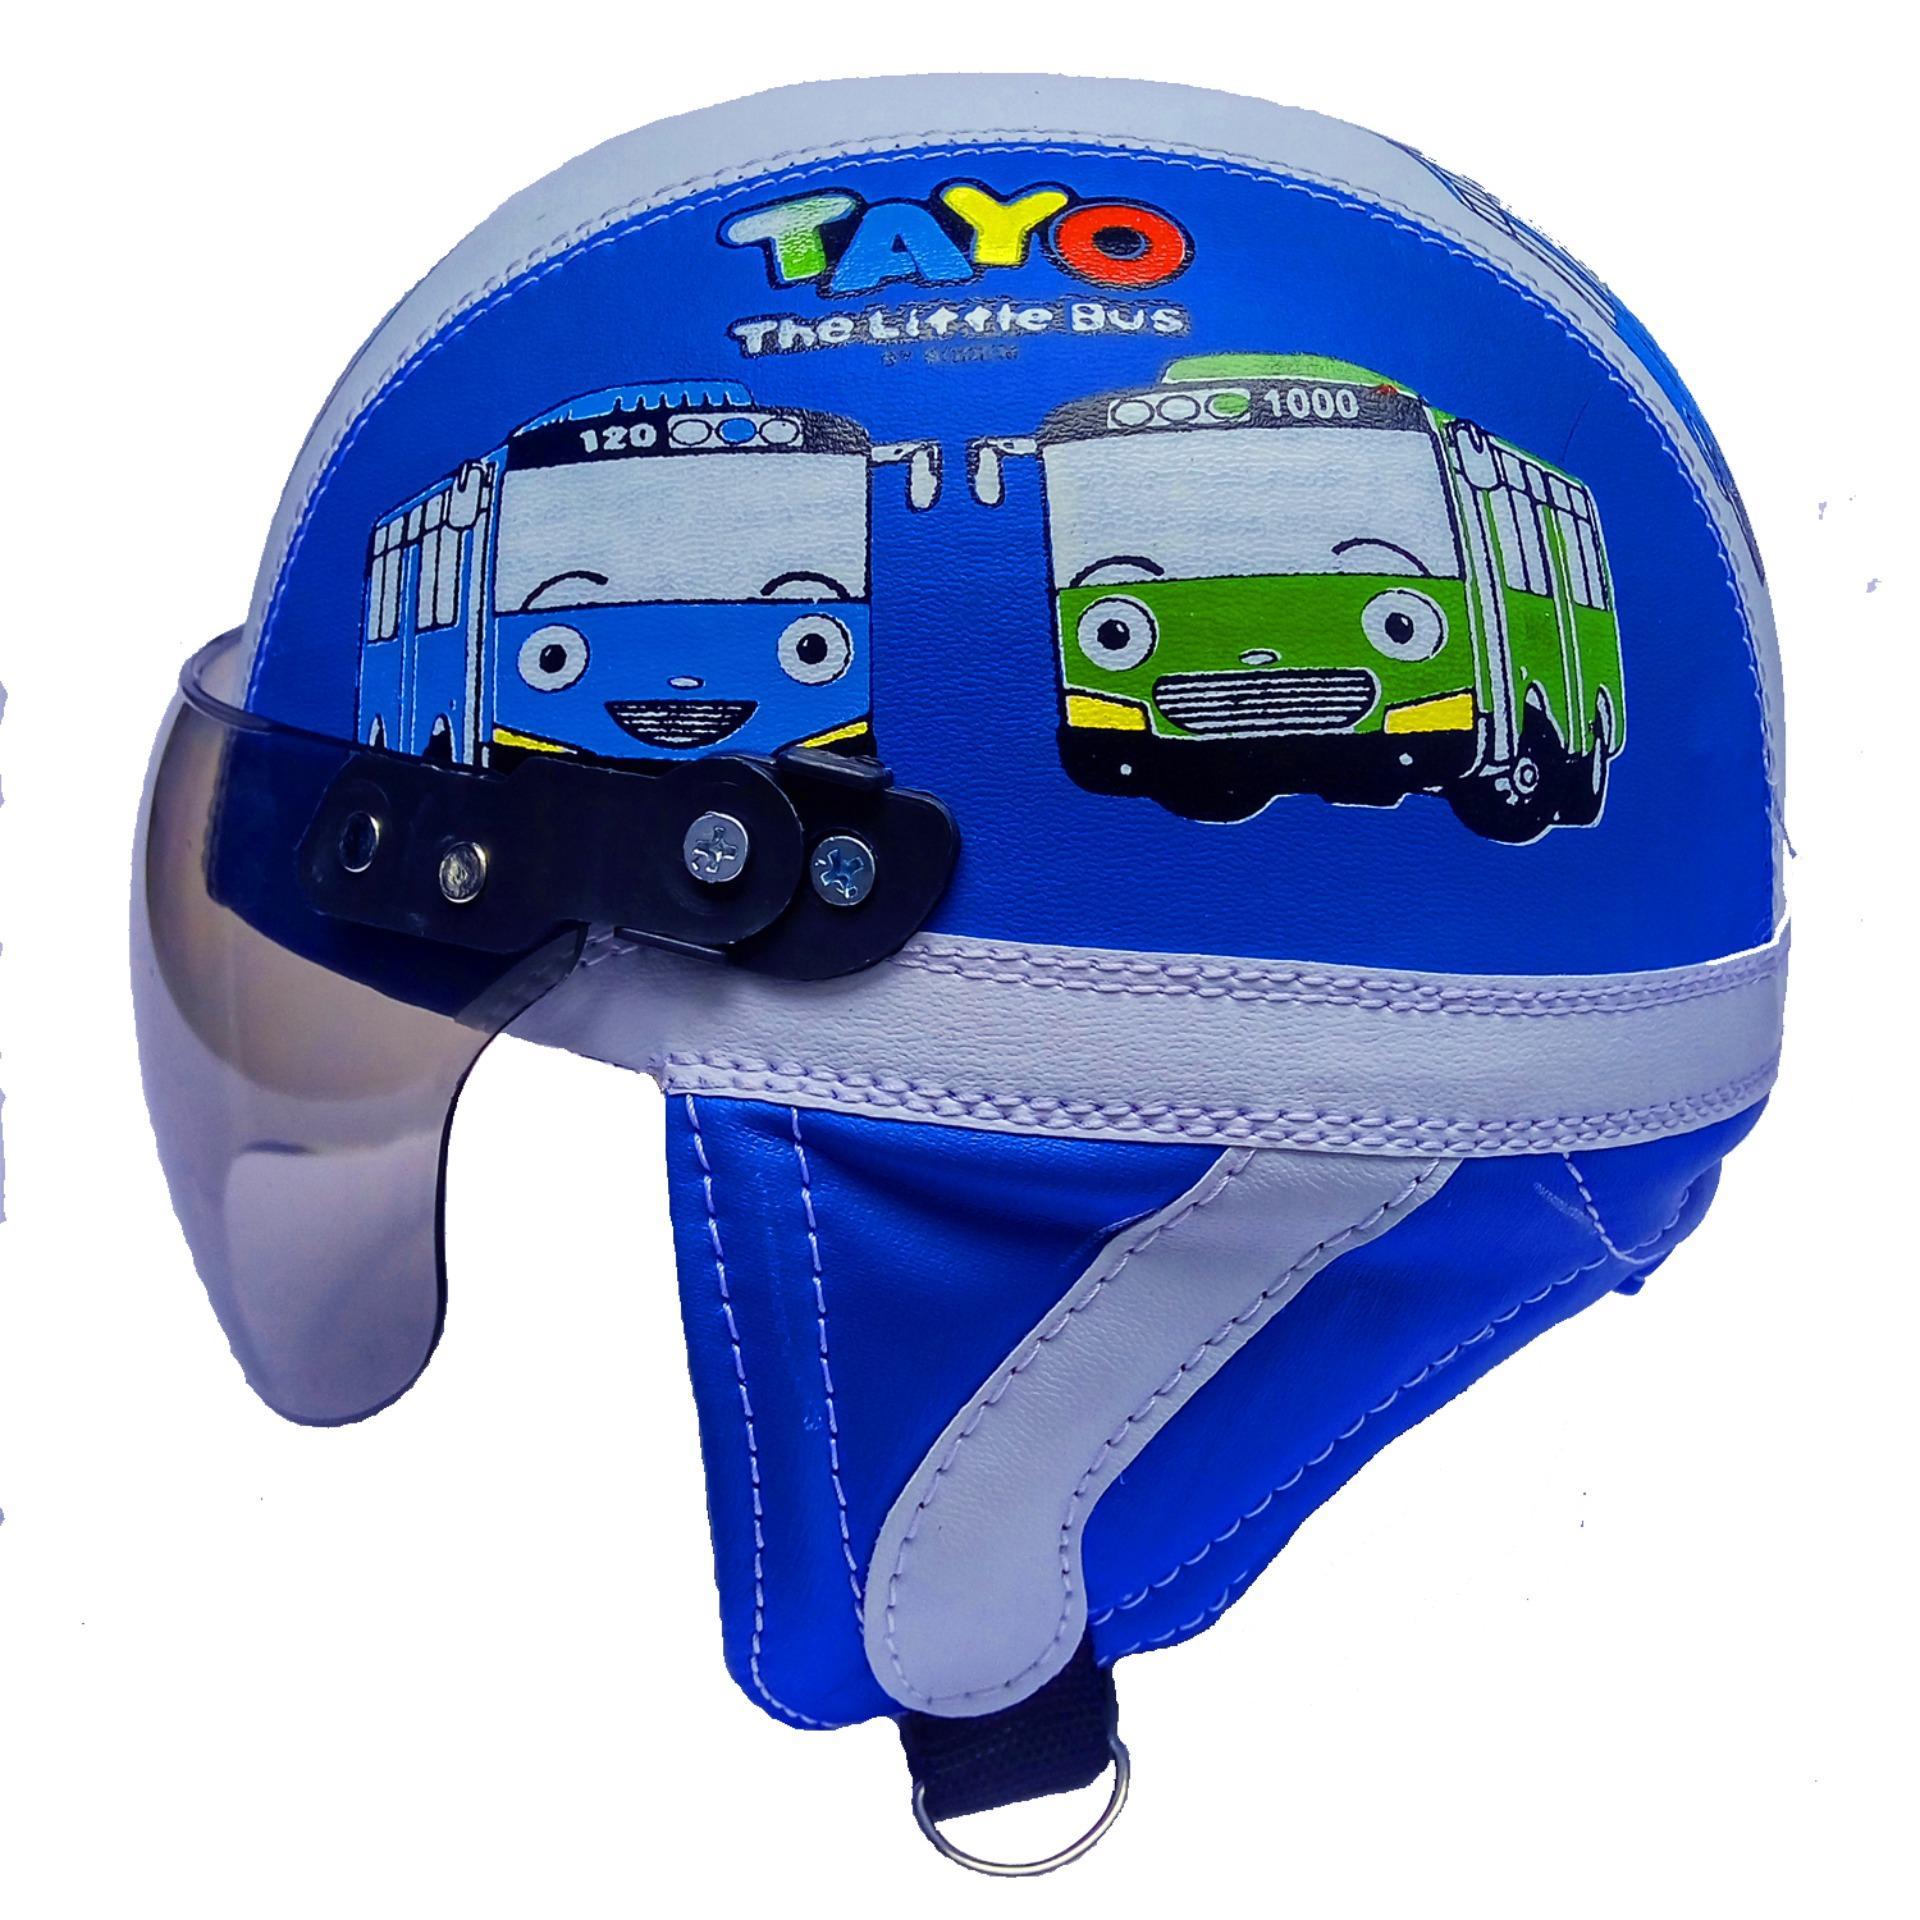 Helm Berkendara Motor Helem Sepeda Anak Broco Retro Kaca Riben Lucu Usia 1 Sampai 4 Tahun Motif Tayo Biru